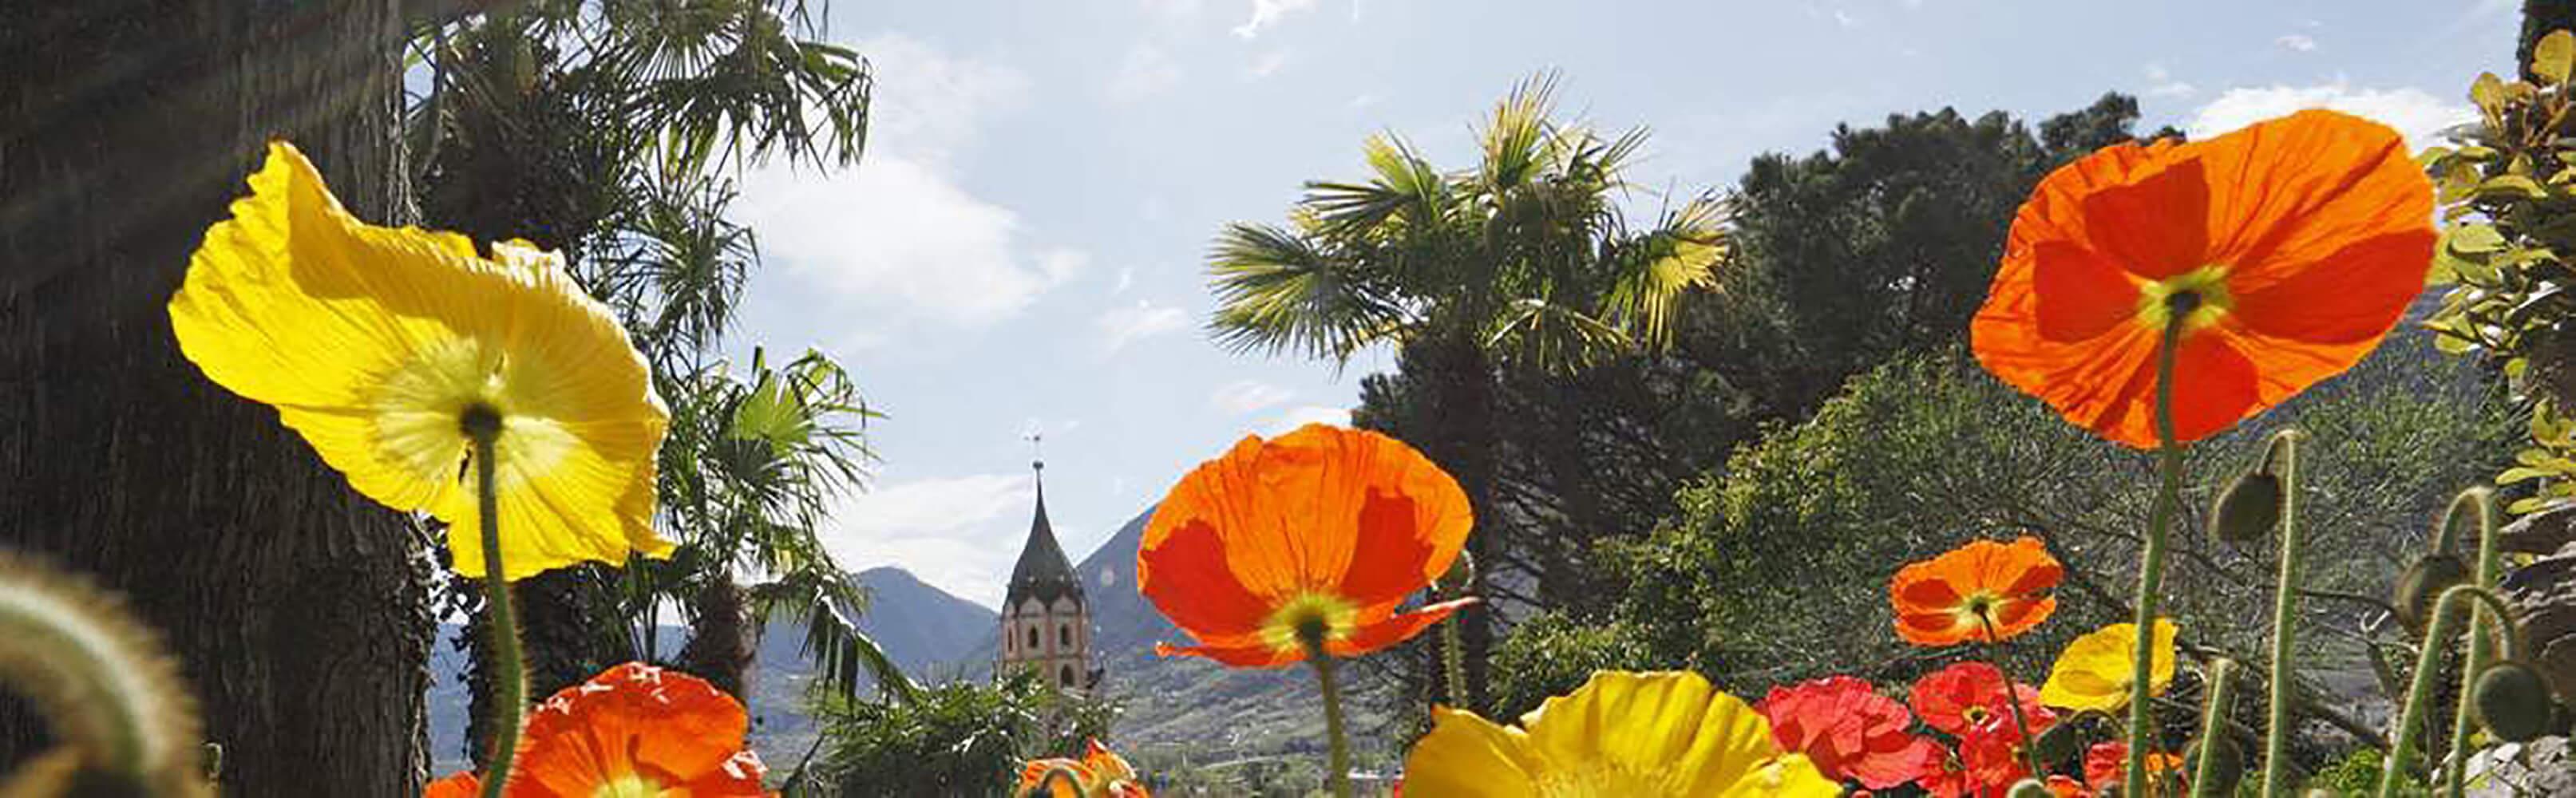 Meran - bekannter Kurort in Südtirol 1